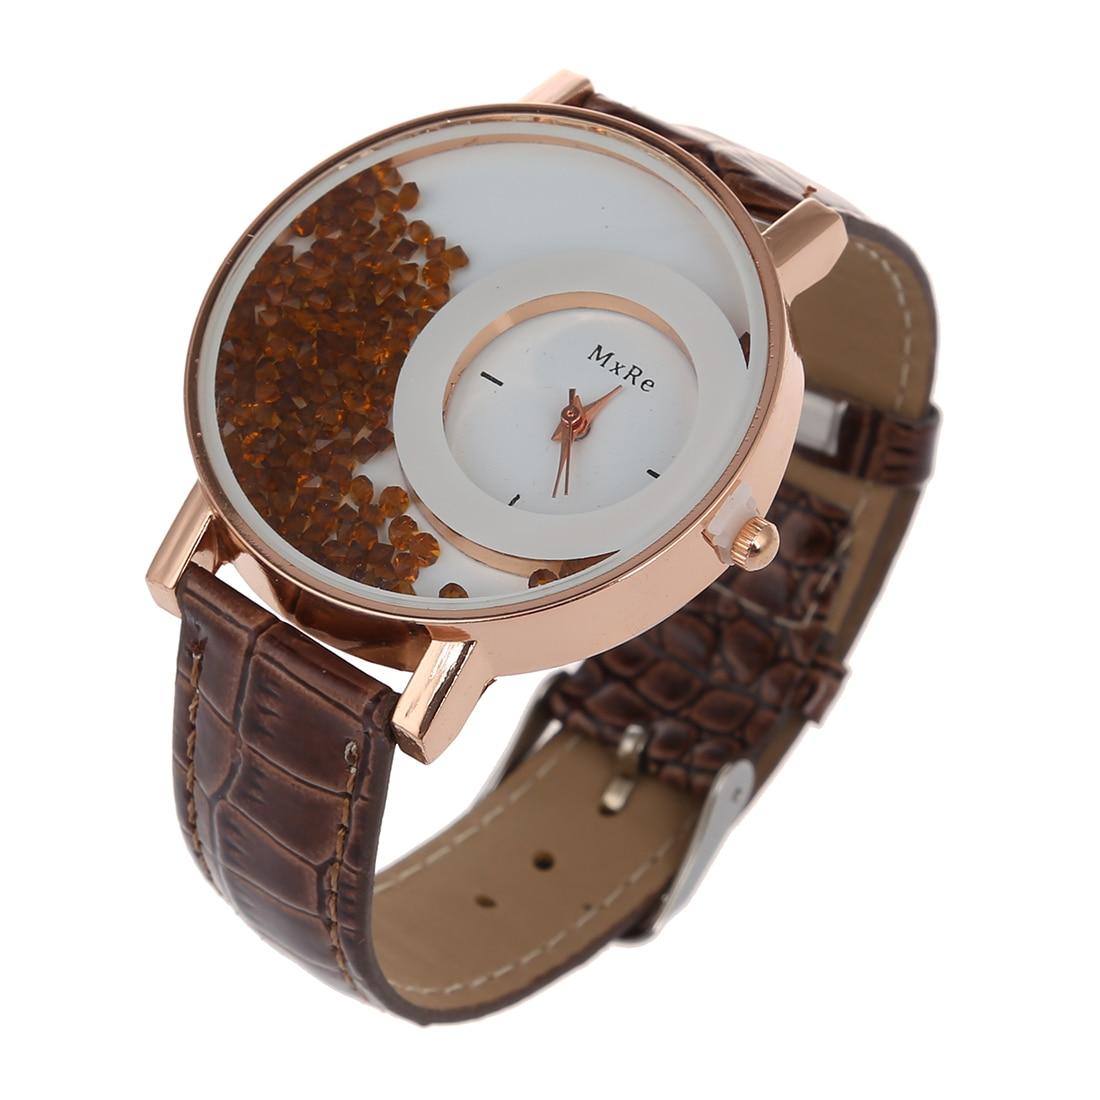 MXRE Women's Rhinestones Faux Leather Wrist Watch Brown